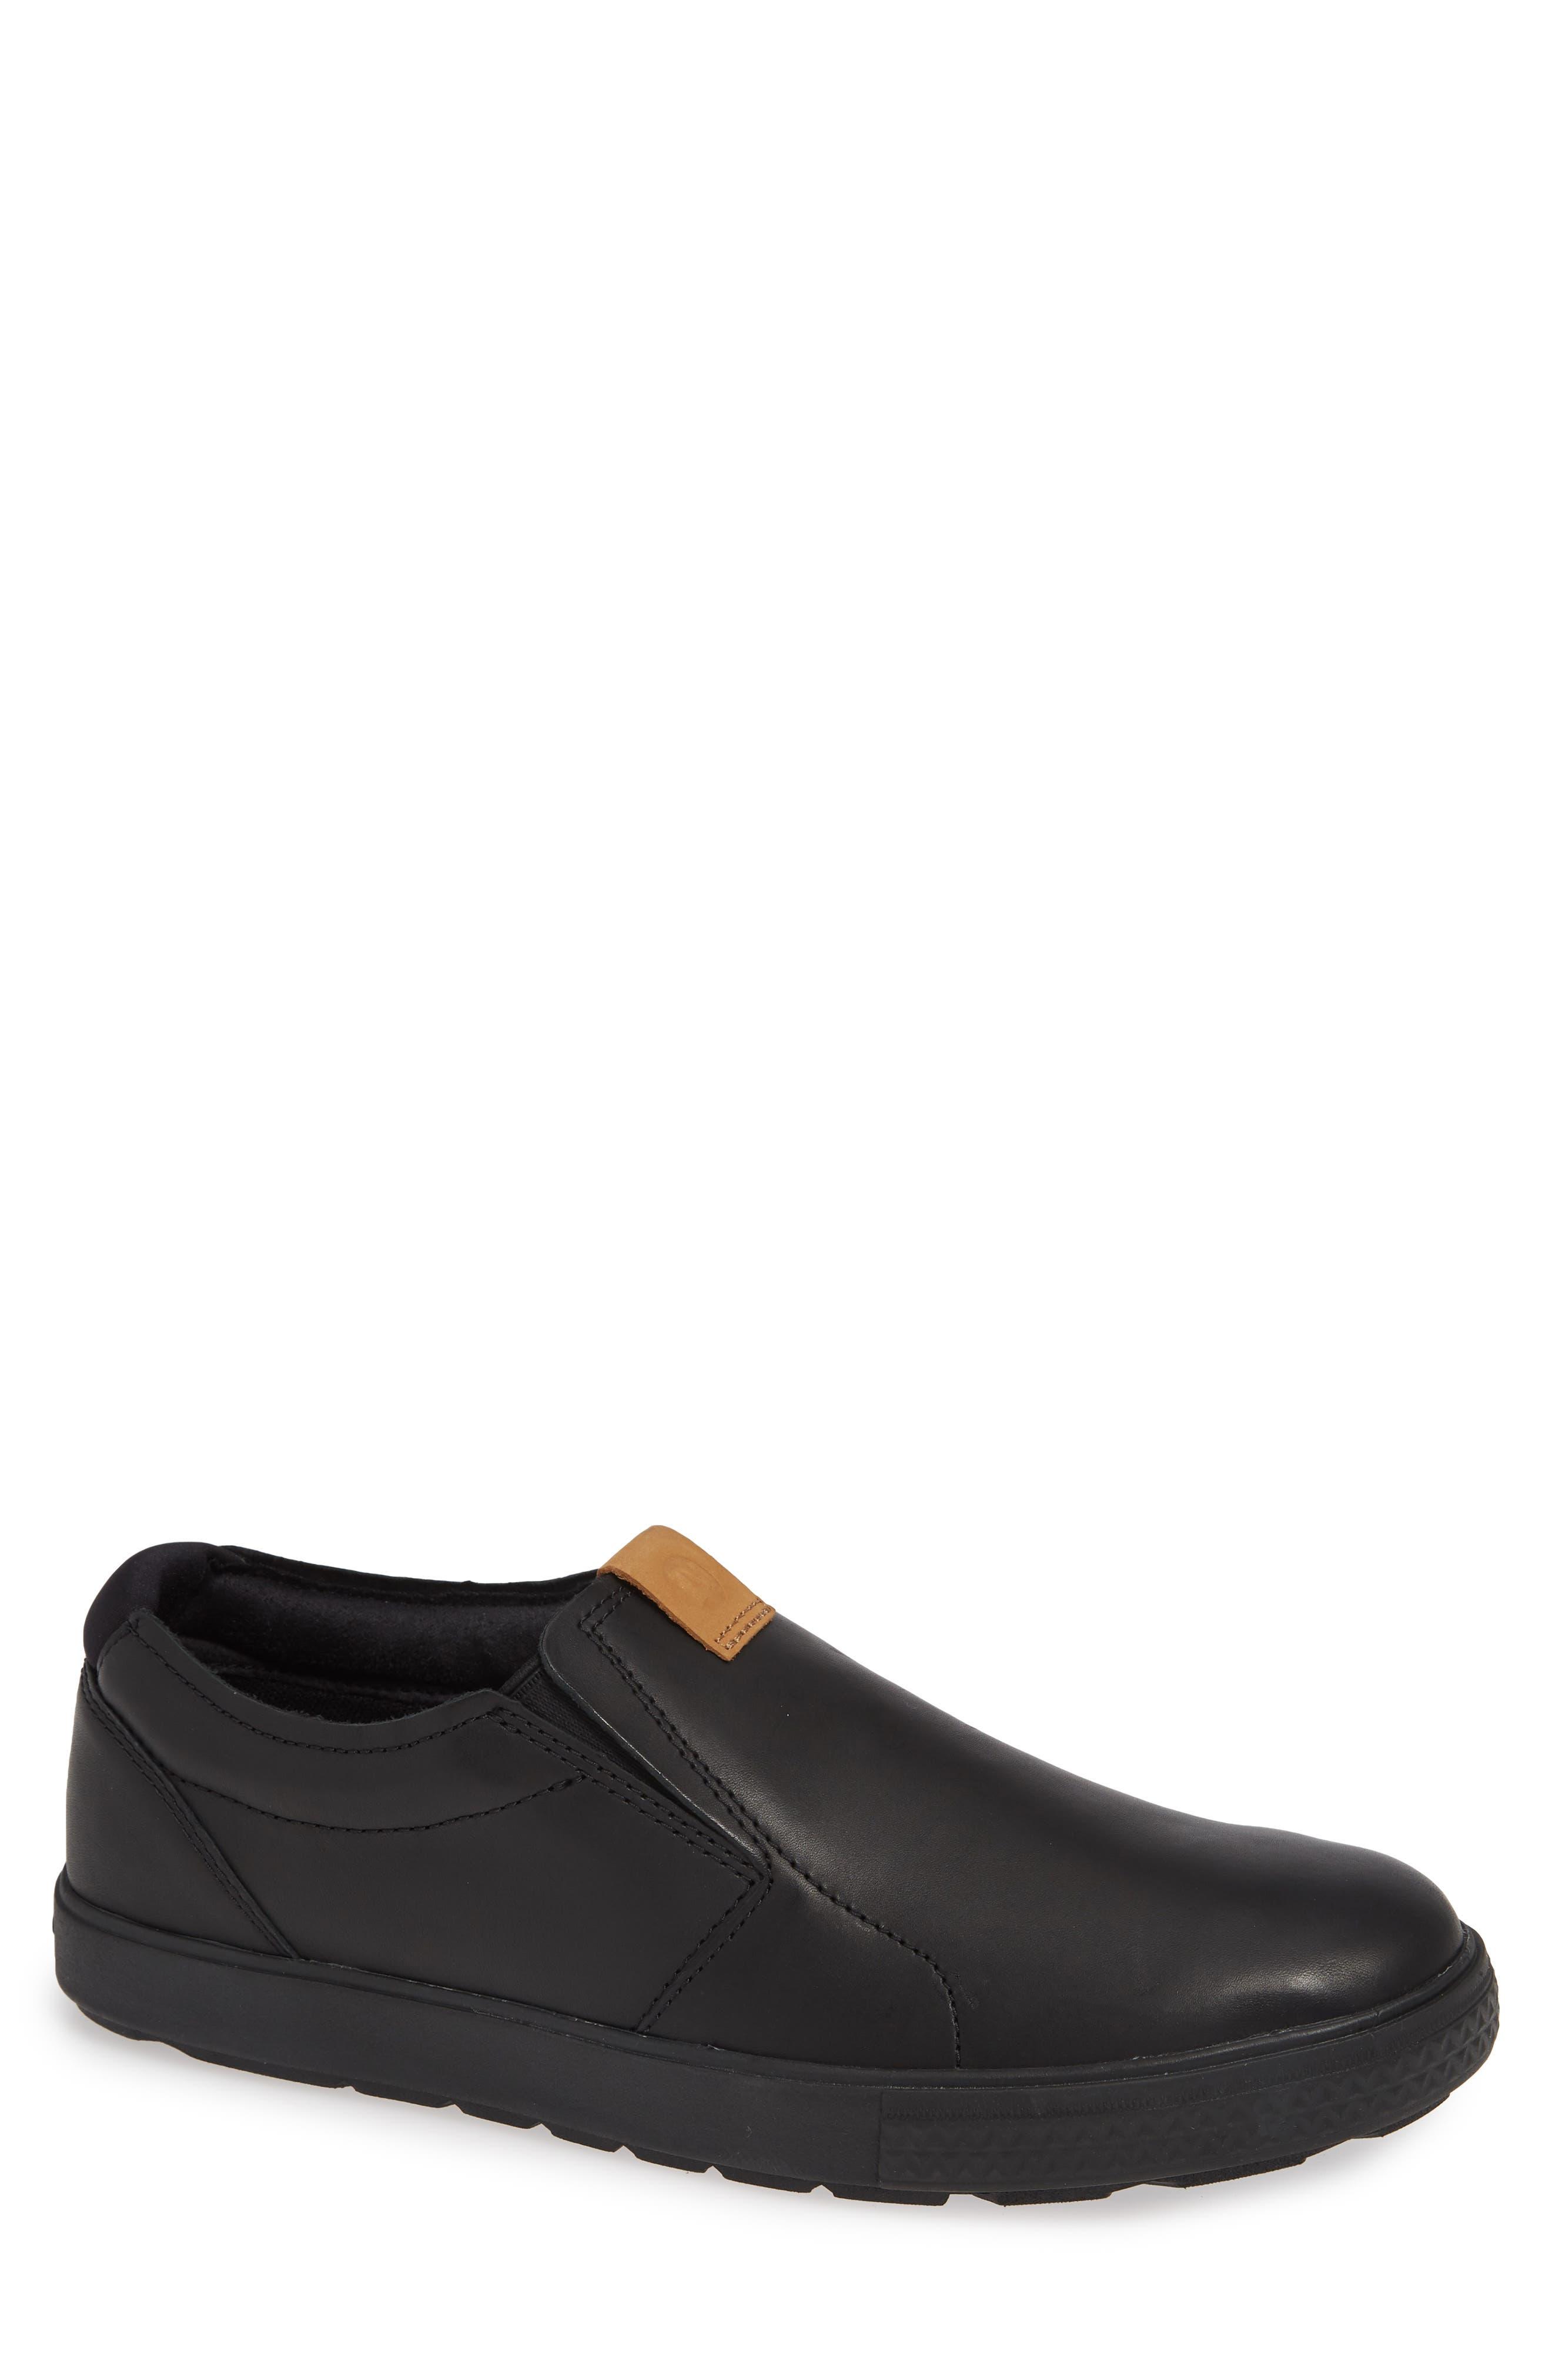 Barkley Slip-On,                         Main,                         color, BLACK